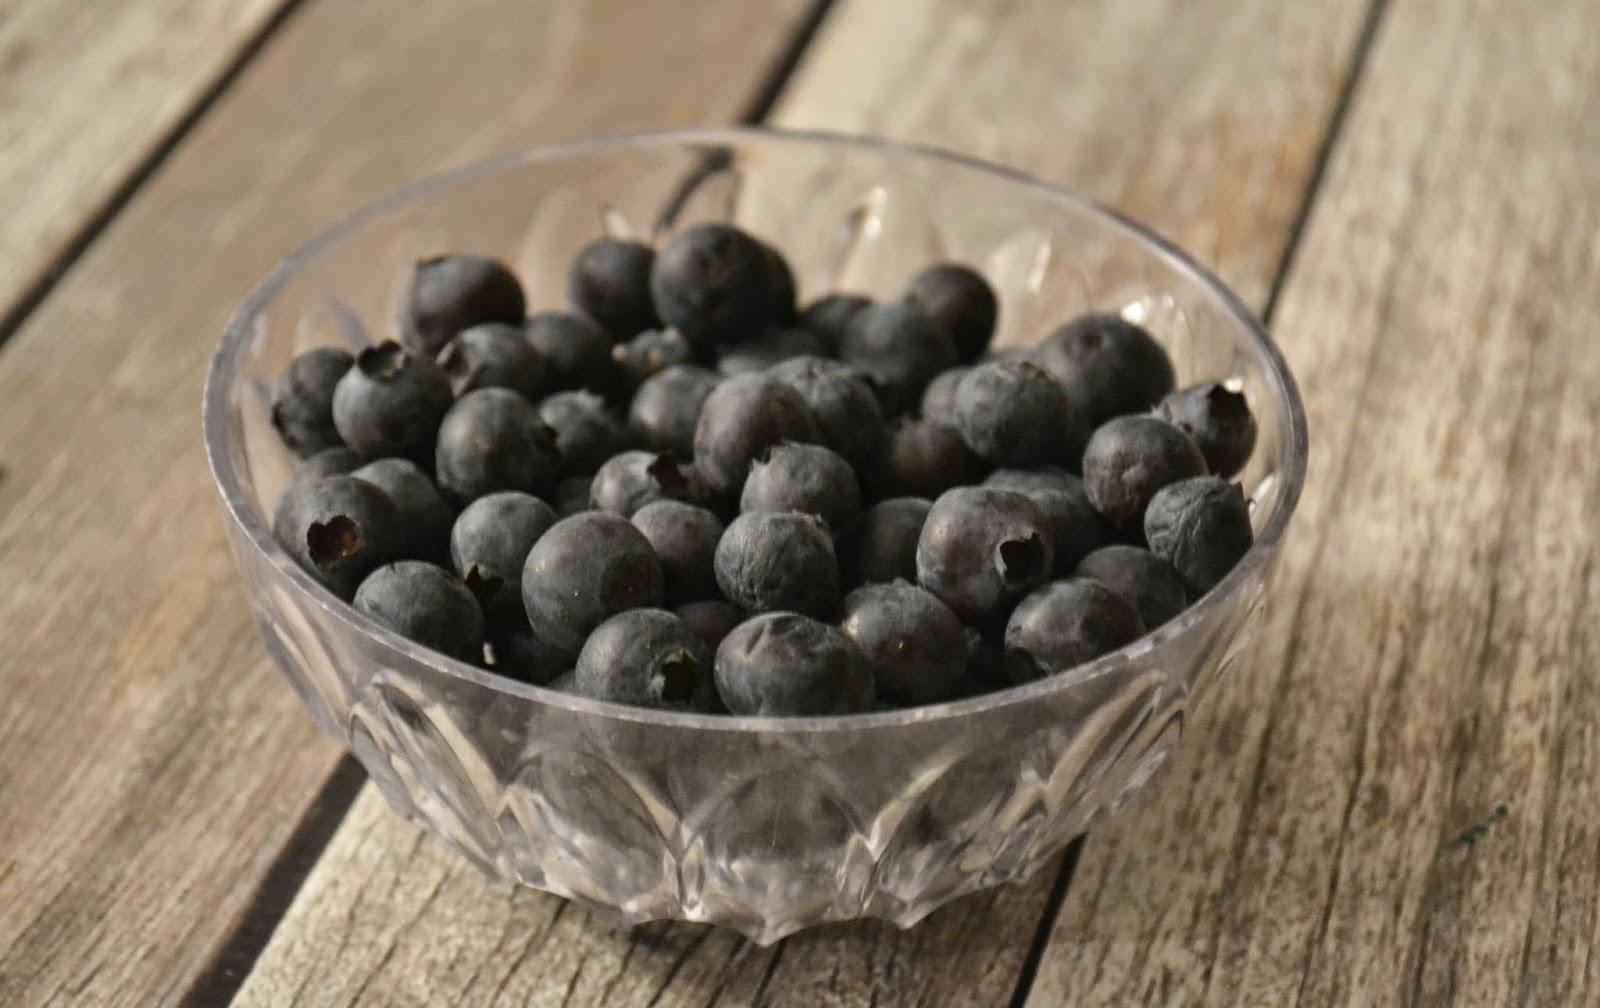 Greek Yogurt Blueberry Muffins #Recipe.  Easy Blueberry Muffin Recipe.  Muffin recipe with Greek Yogurt.  Greek Yogurt Muffins.  Blueberries for snacks.  Healthy snacks.